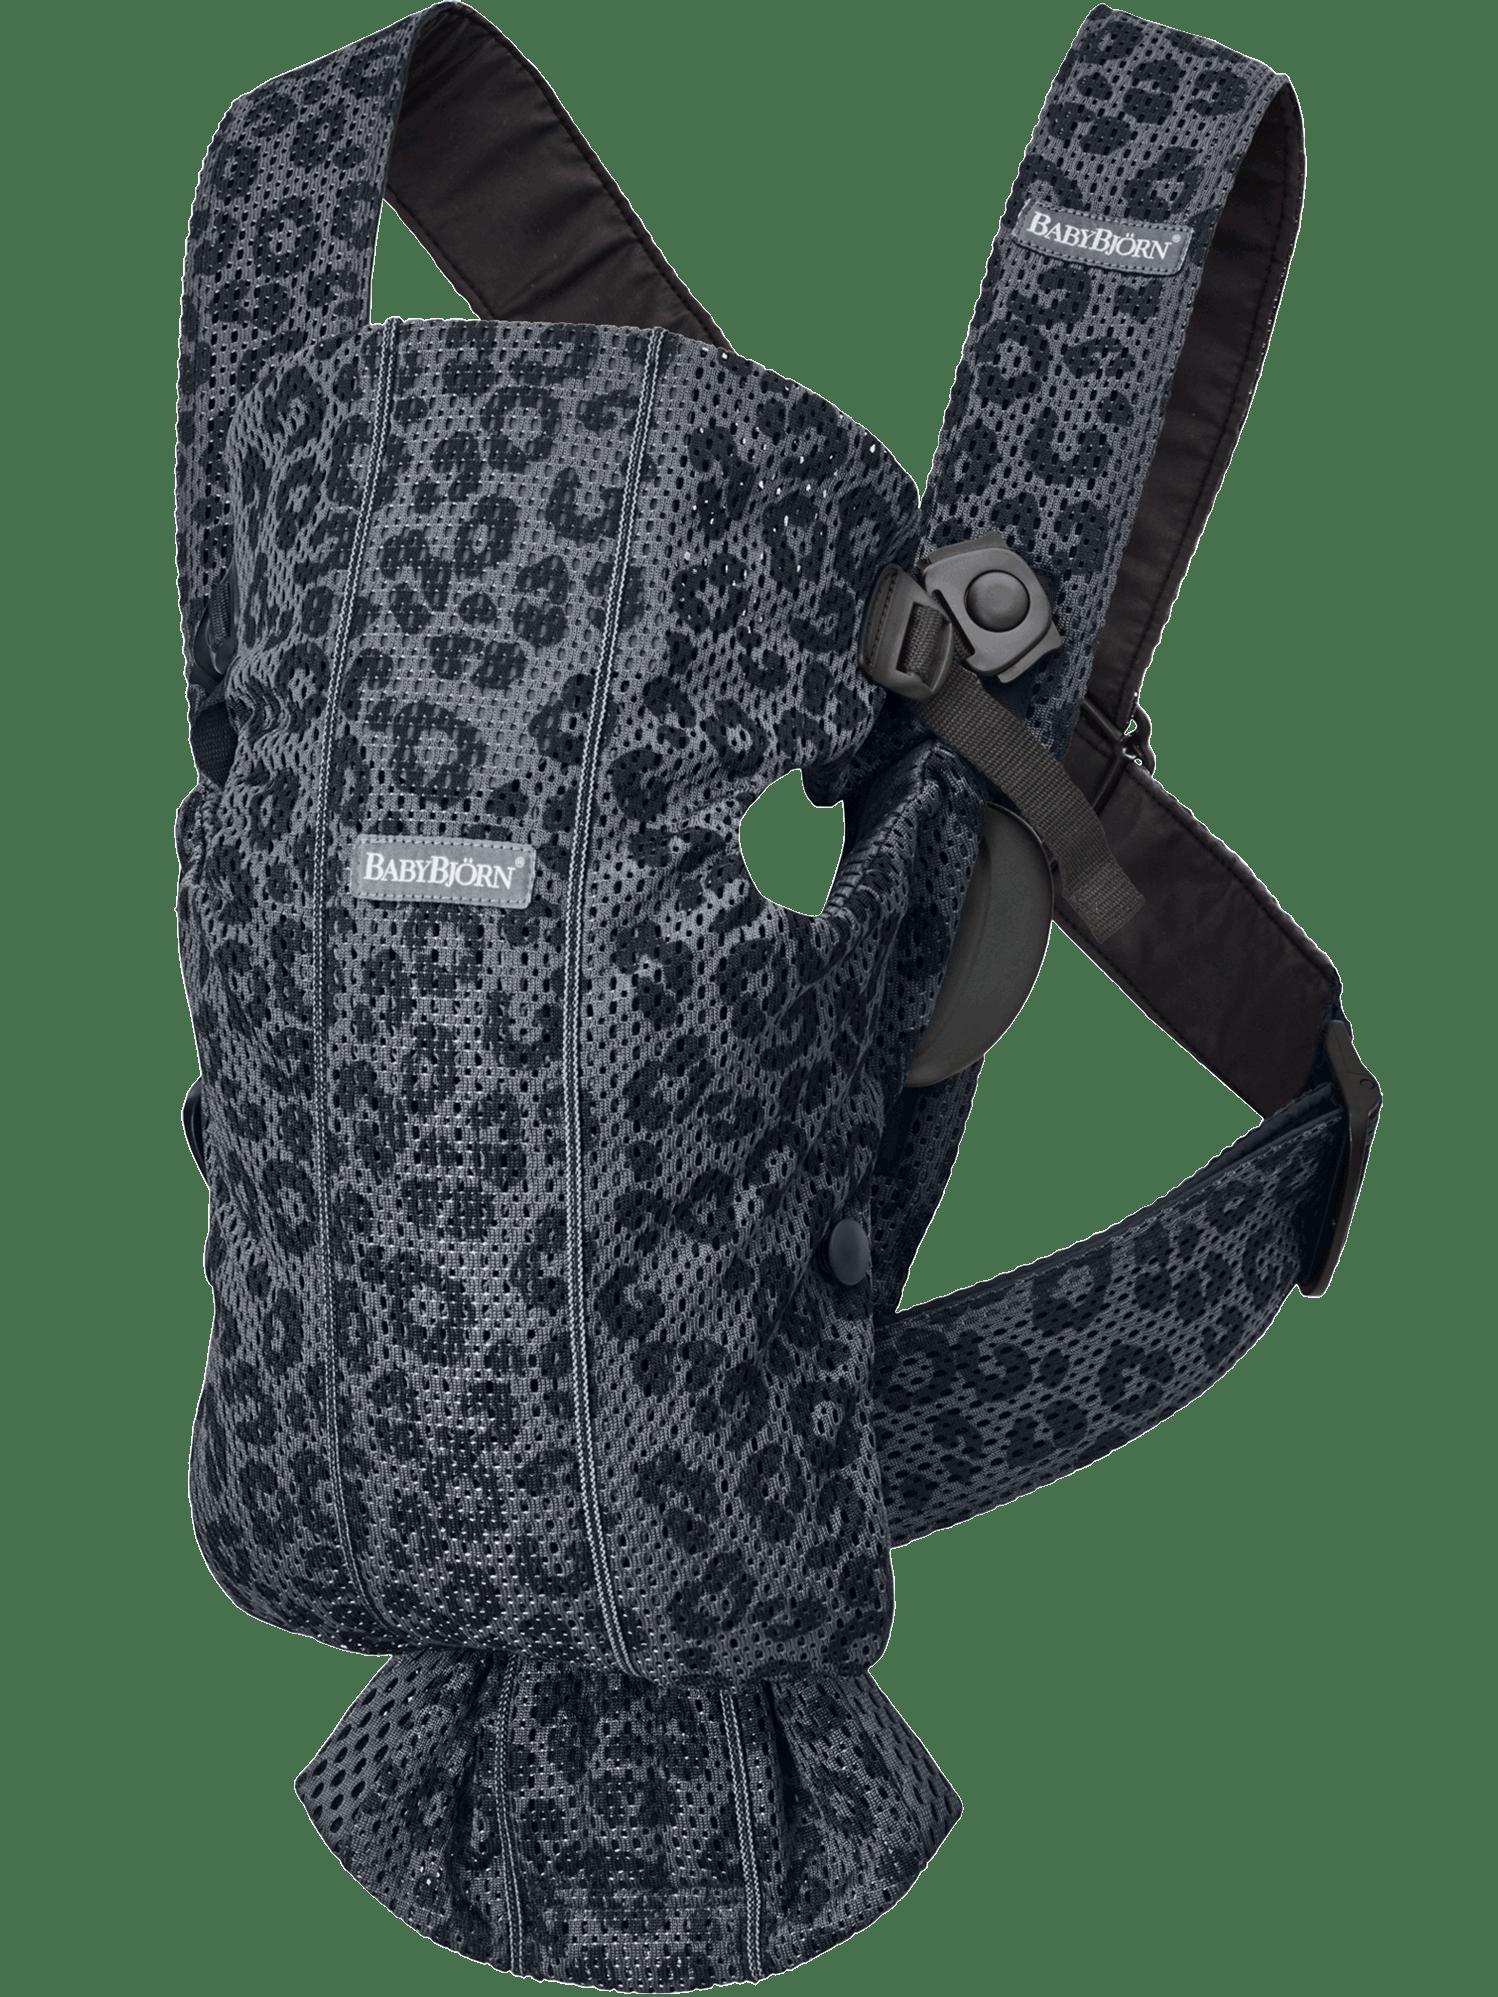 BABYBJÖRN Babytrage Mini - Anthrazitgrau/Leopard, 3D-Netzstoff